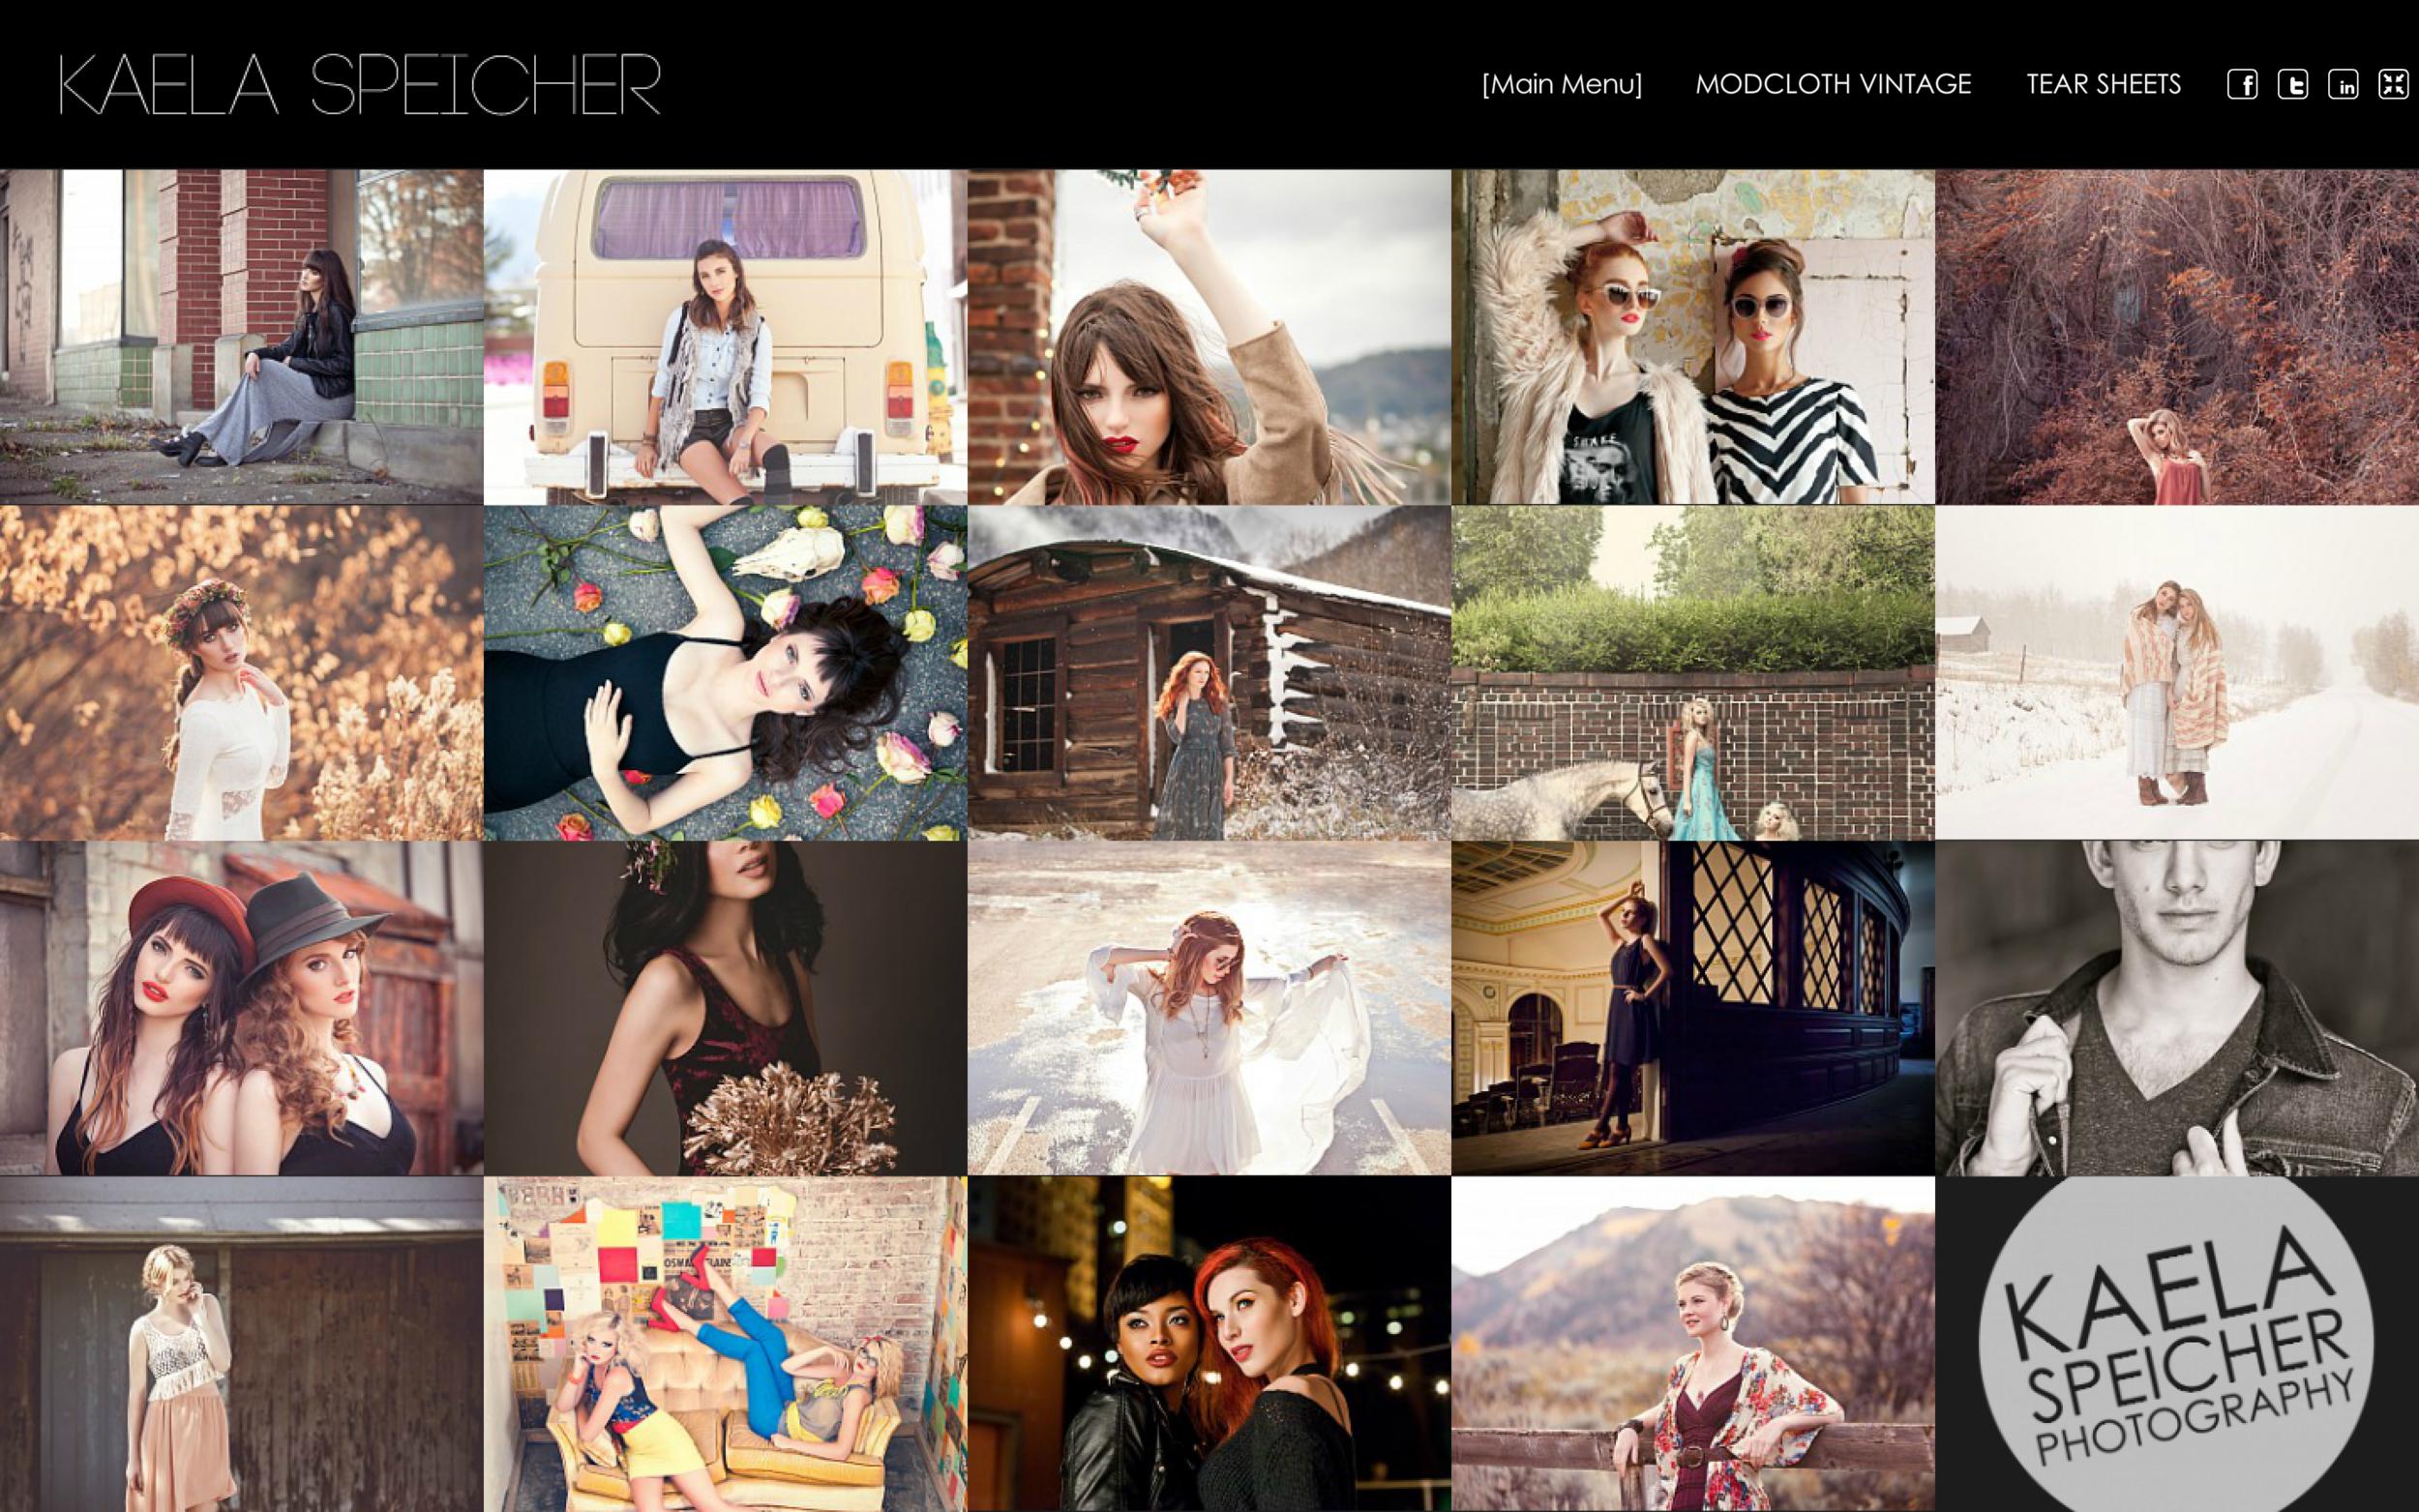 kaela-speicher-fashion-photographer